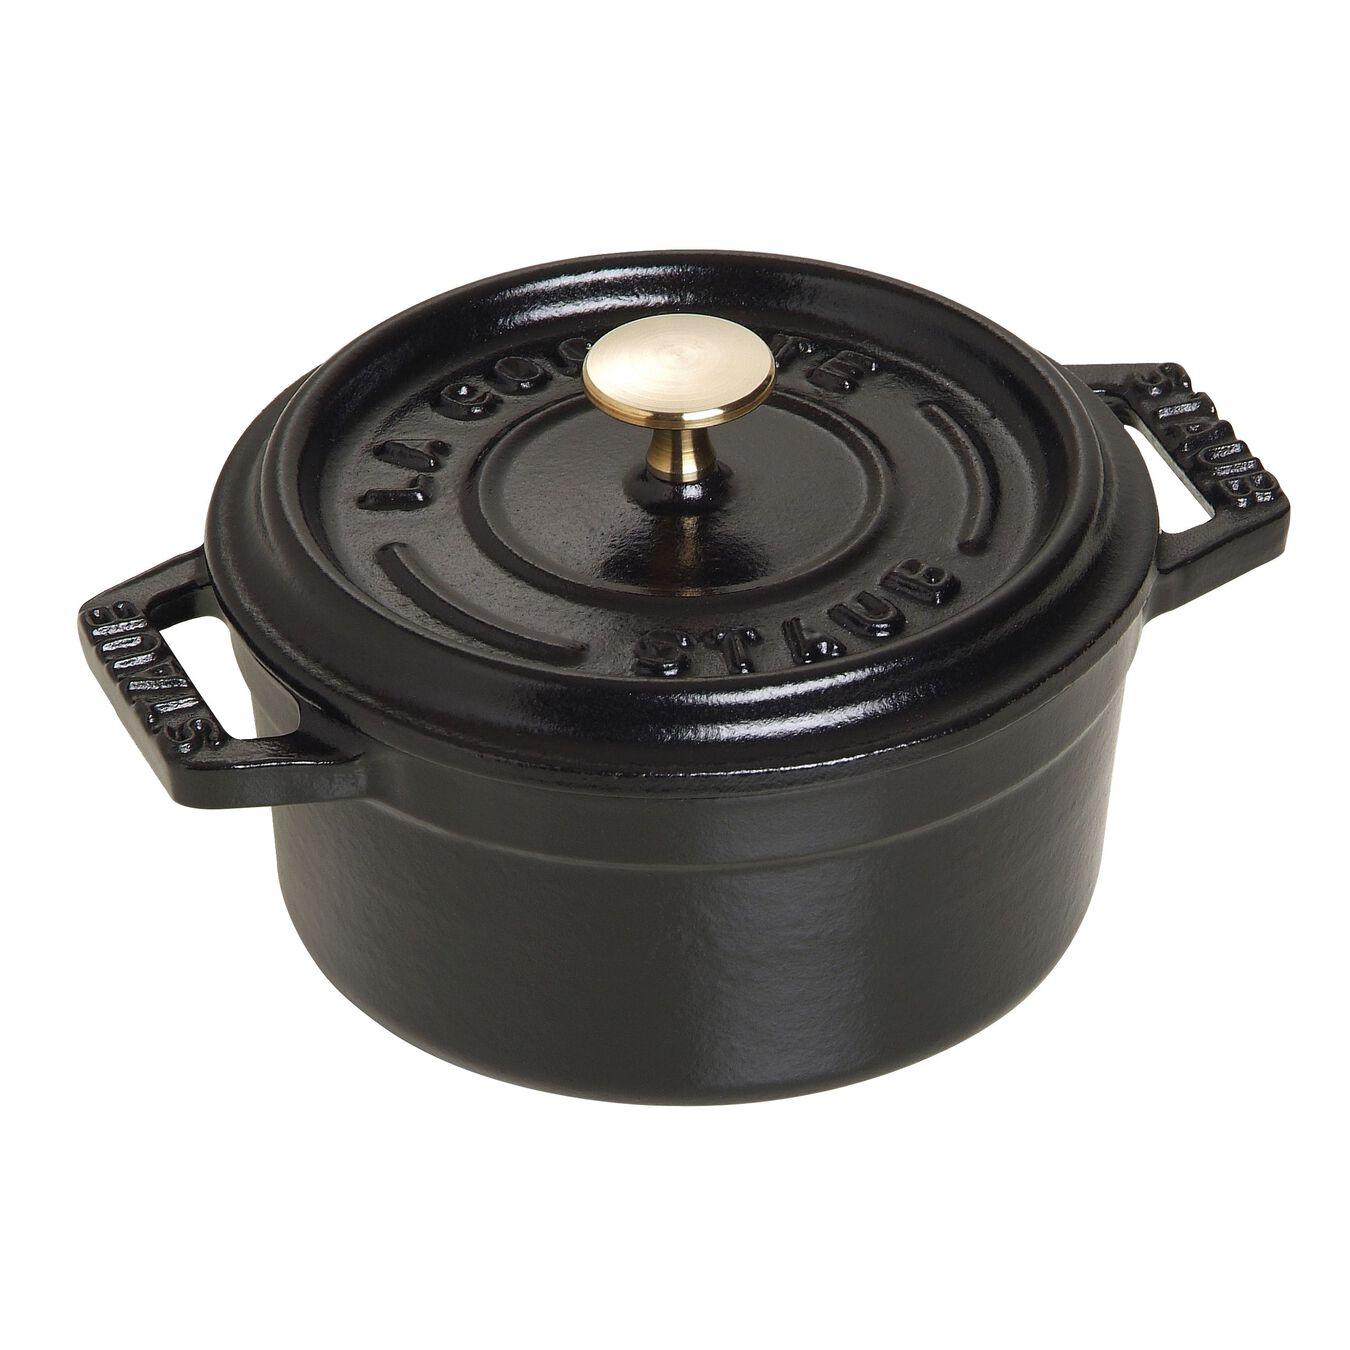 Mini cocotte rotonda - 10 cm, nero,,large 1